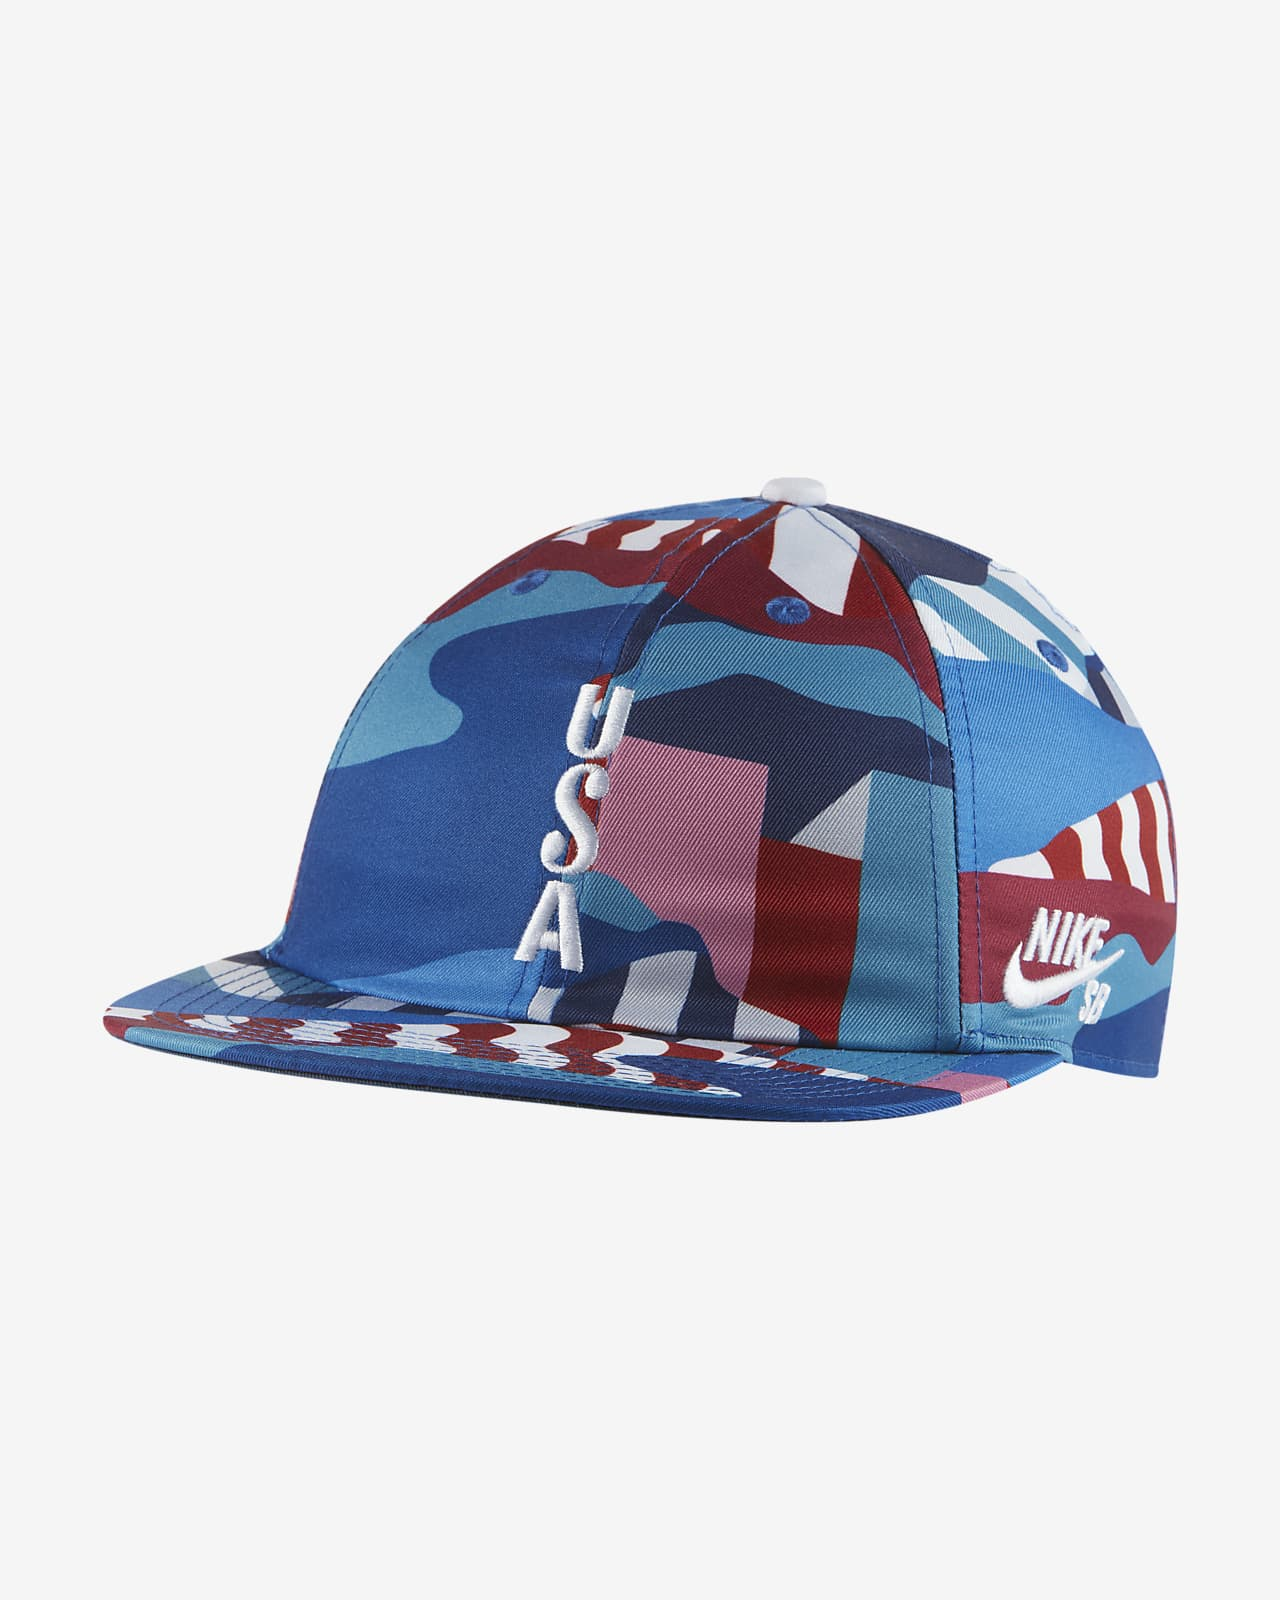 Nike SB Team USA Printed Skate Cap